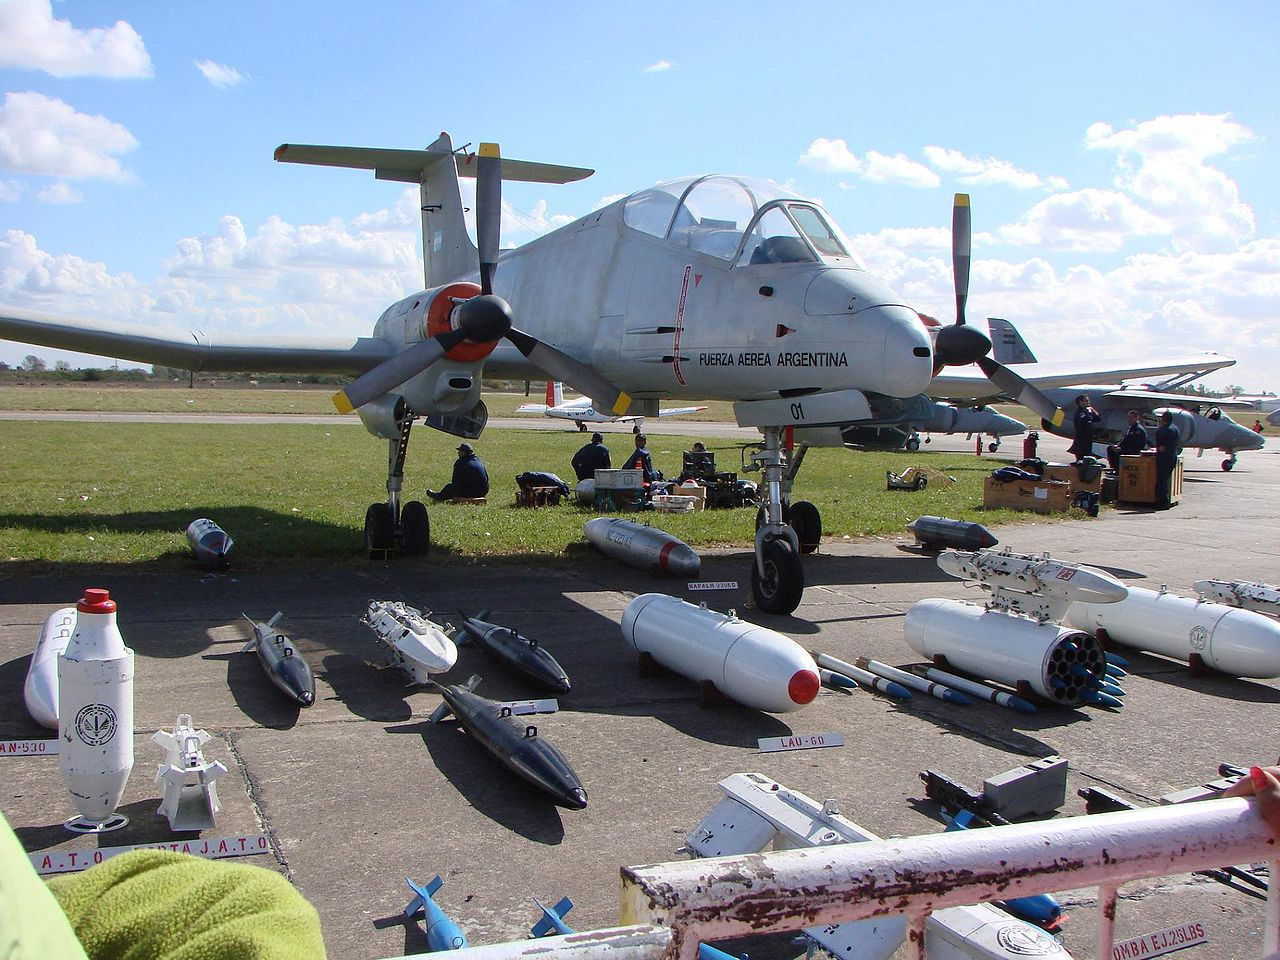 الوداع المؤجل - A-10 Thunderbolt II 1280px-Pucara_armamento_picture